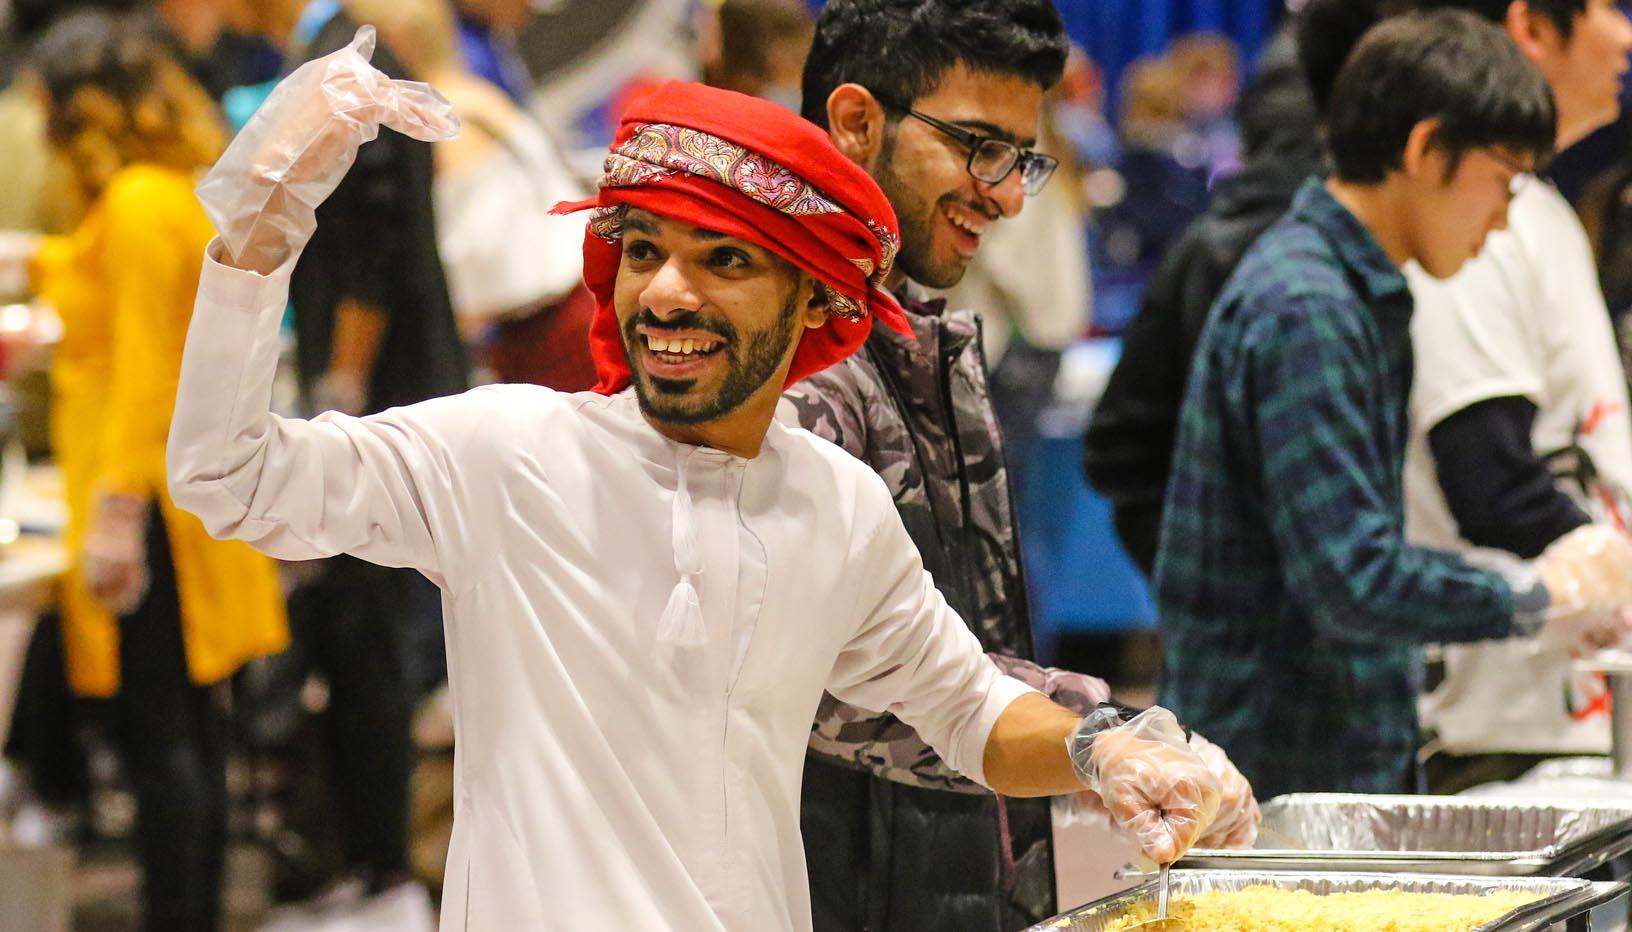 Khalid Alrasbi of Oman serves food at UNK's International Food and Cultural Festival. (Photo by Todd Gottula, UNK Communications)